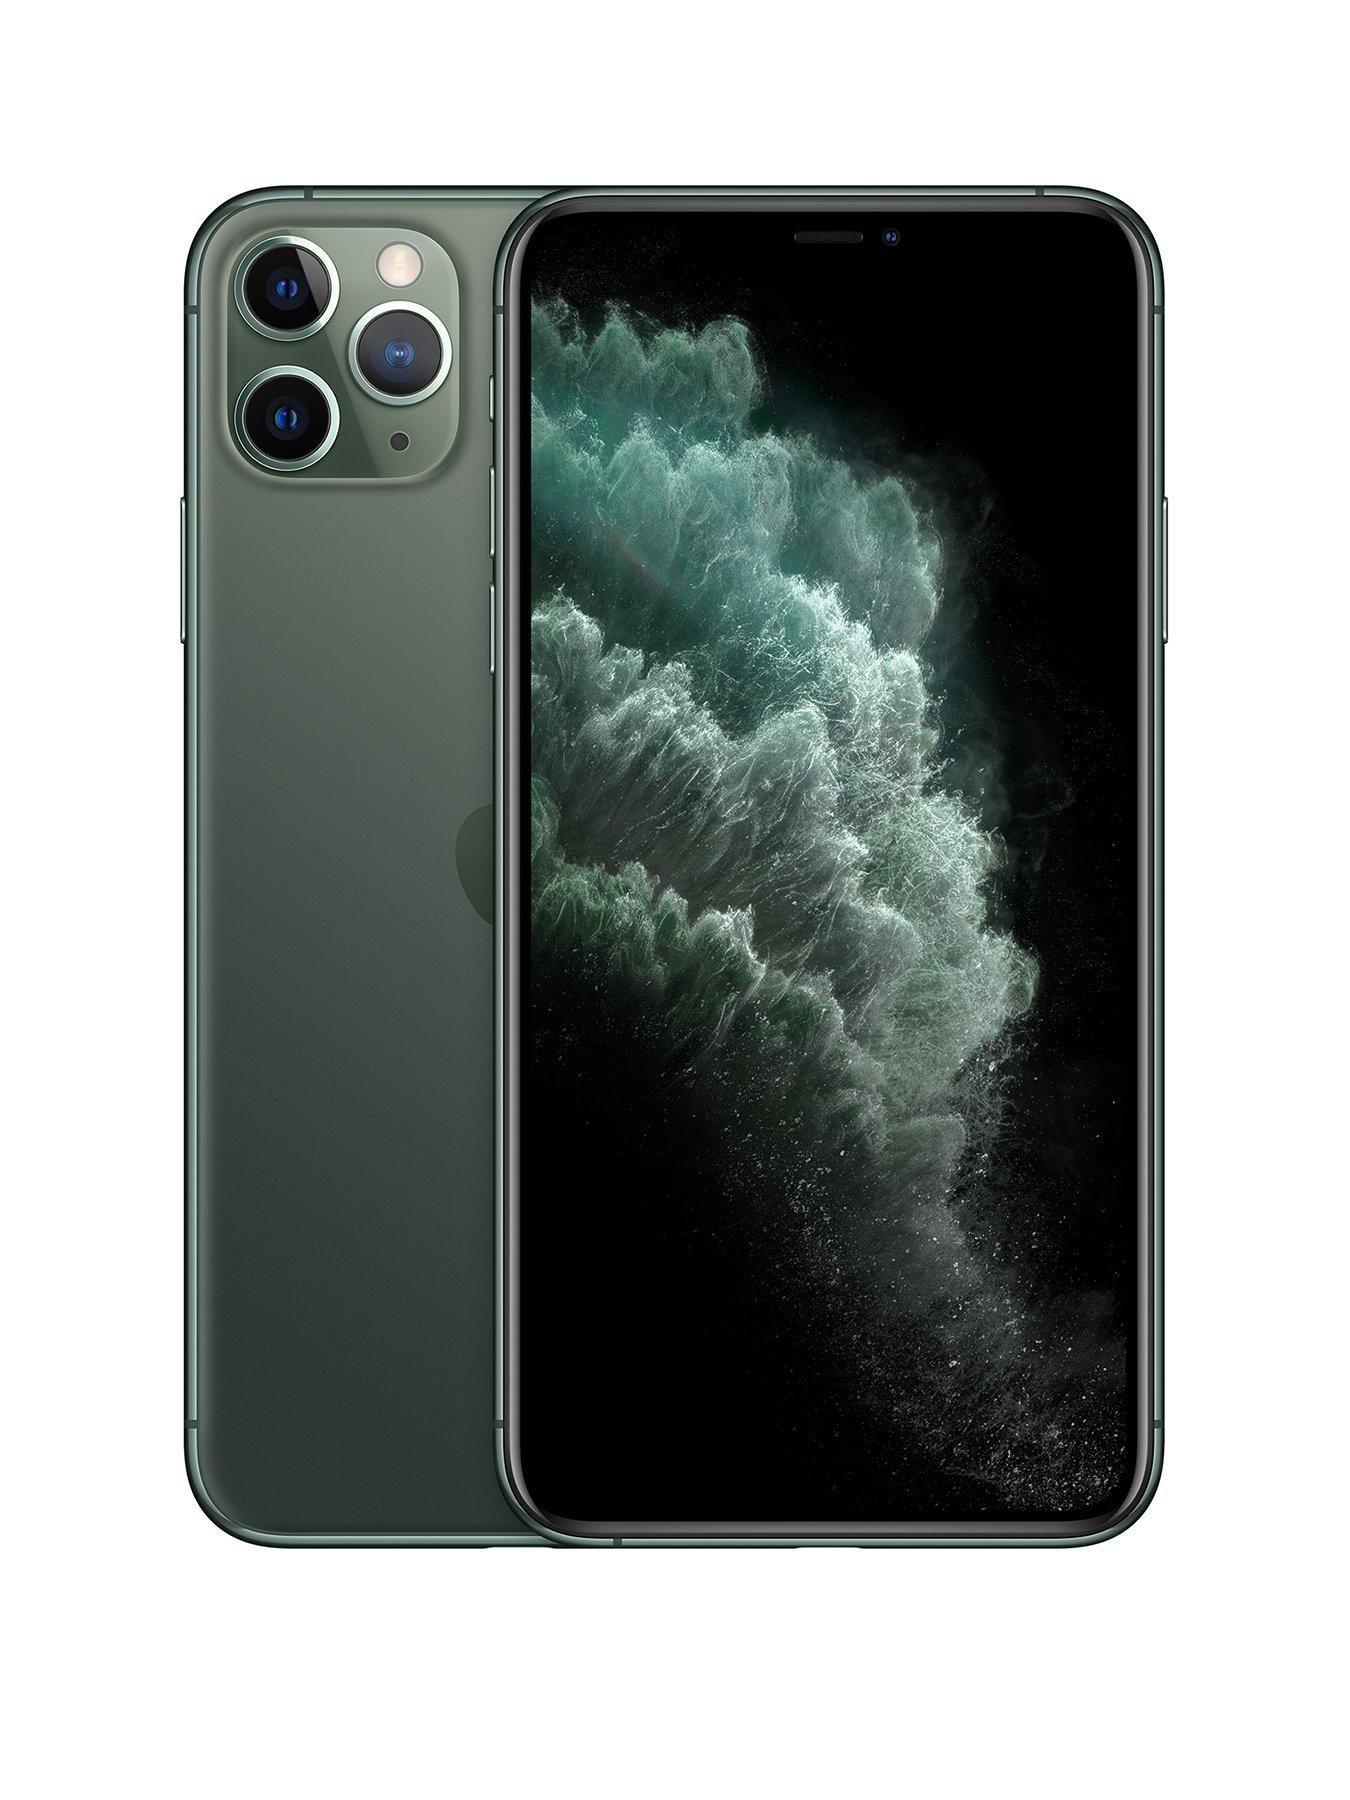 Apple Iphone 11 Pro Max 256gb Midnight Green Iphone Apple Iphone Iphone 11